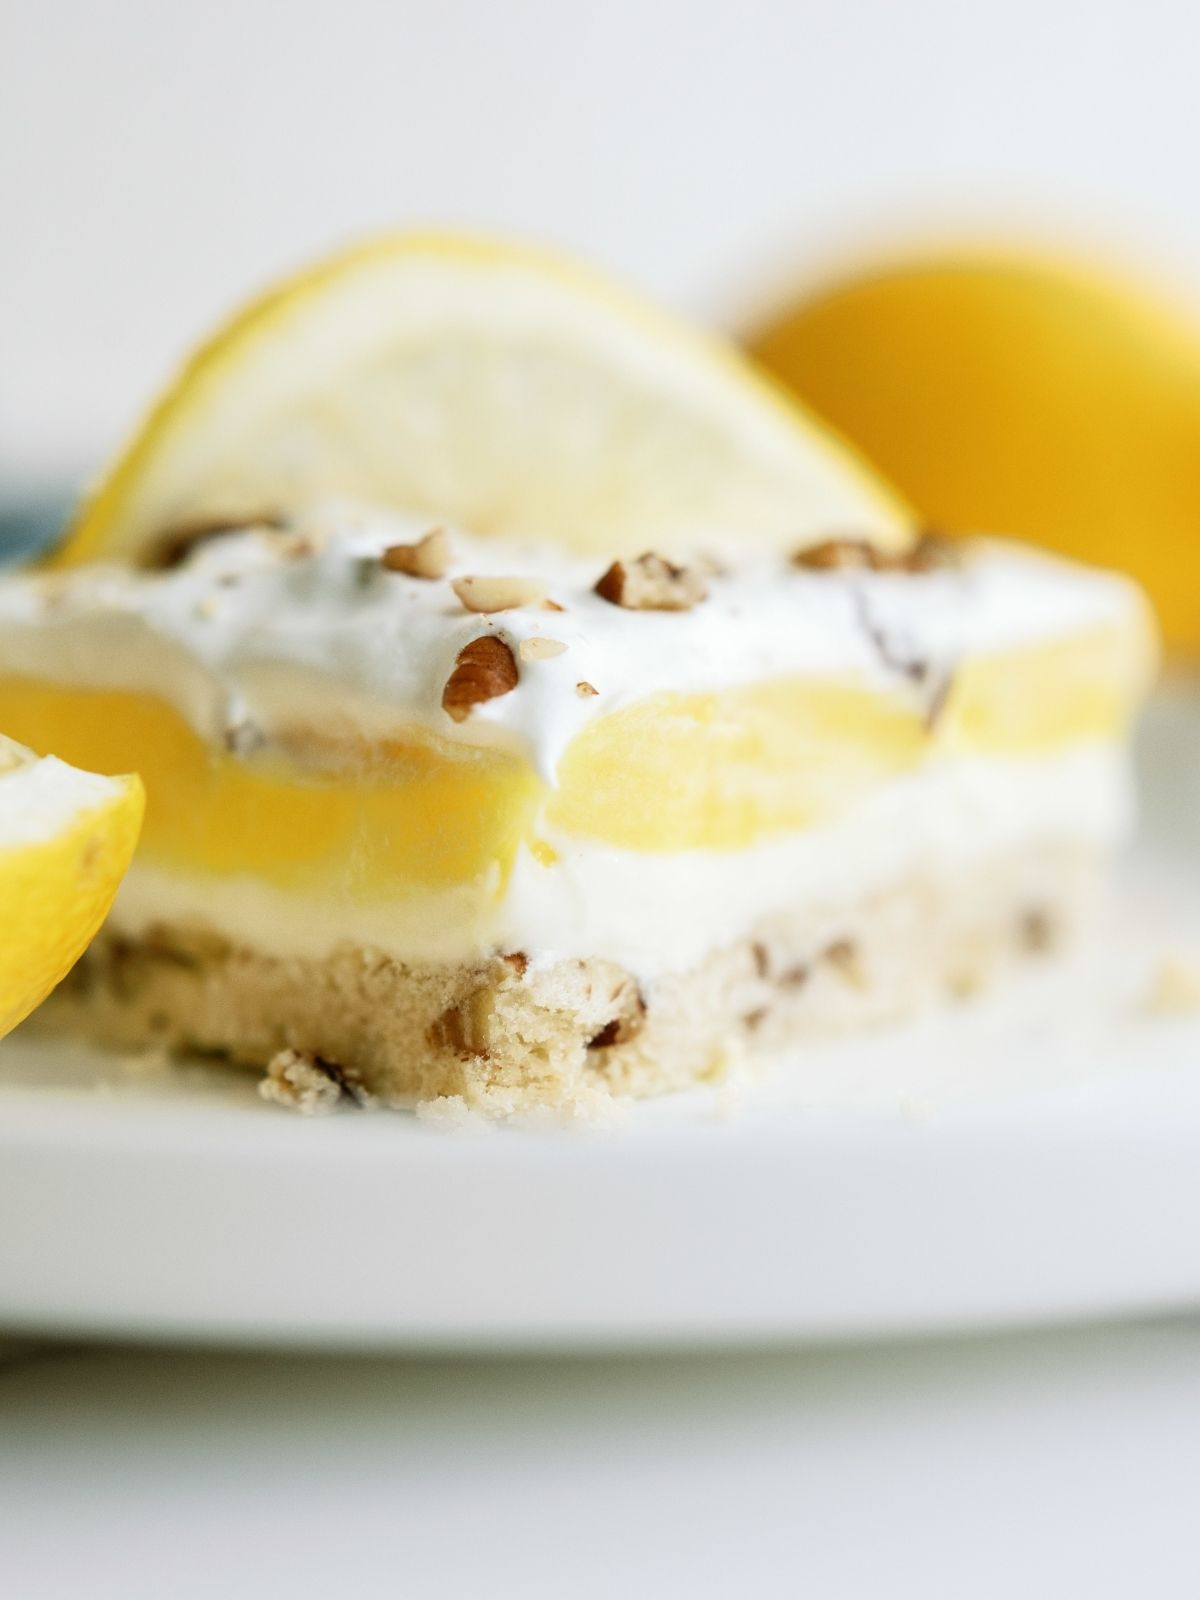 A slice of Layered Lemon Dessert on a white dish